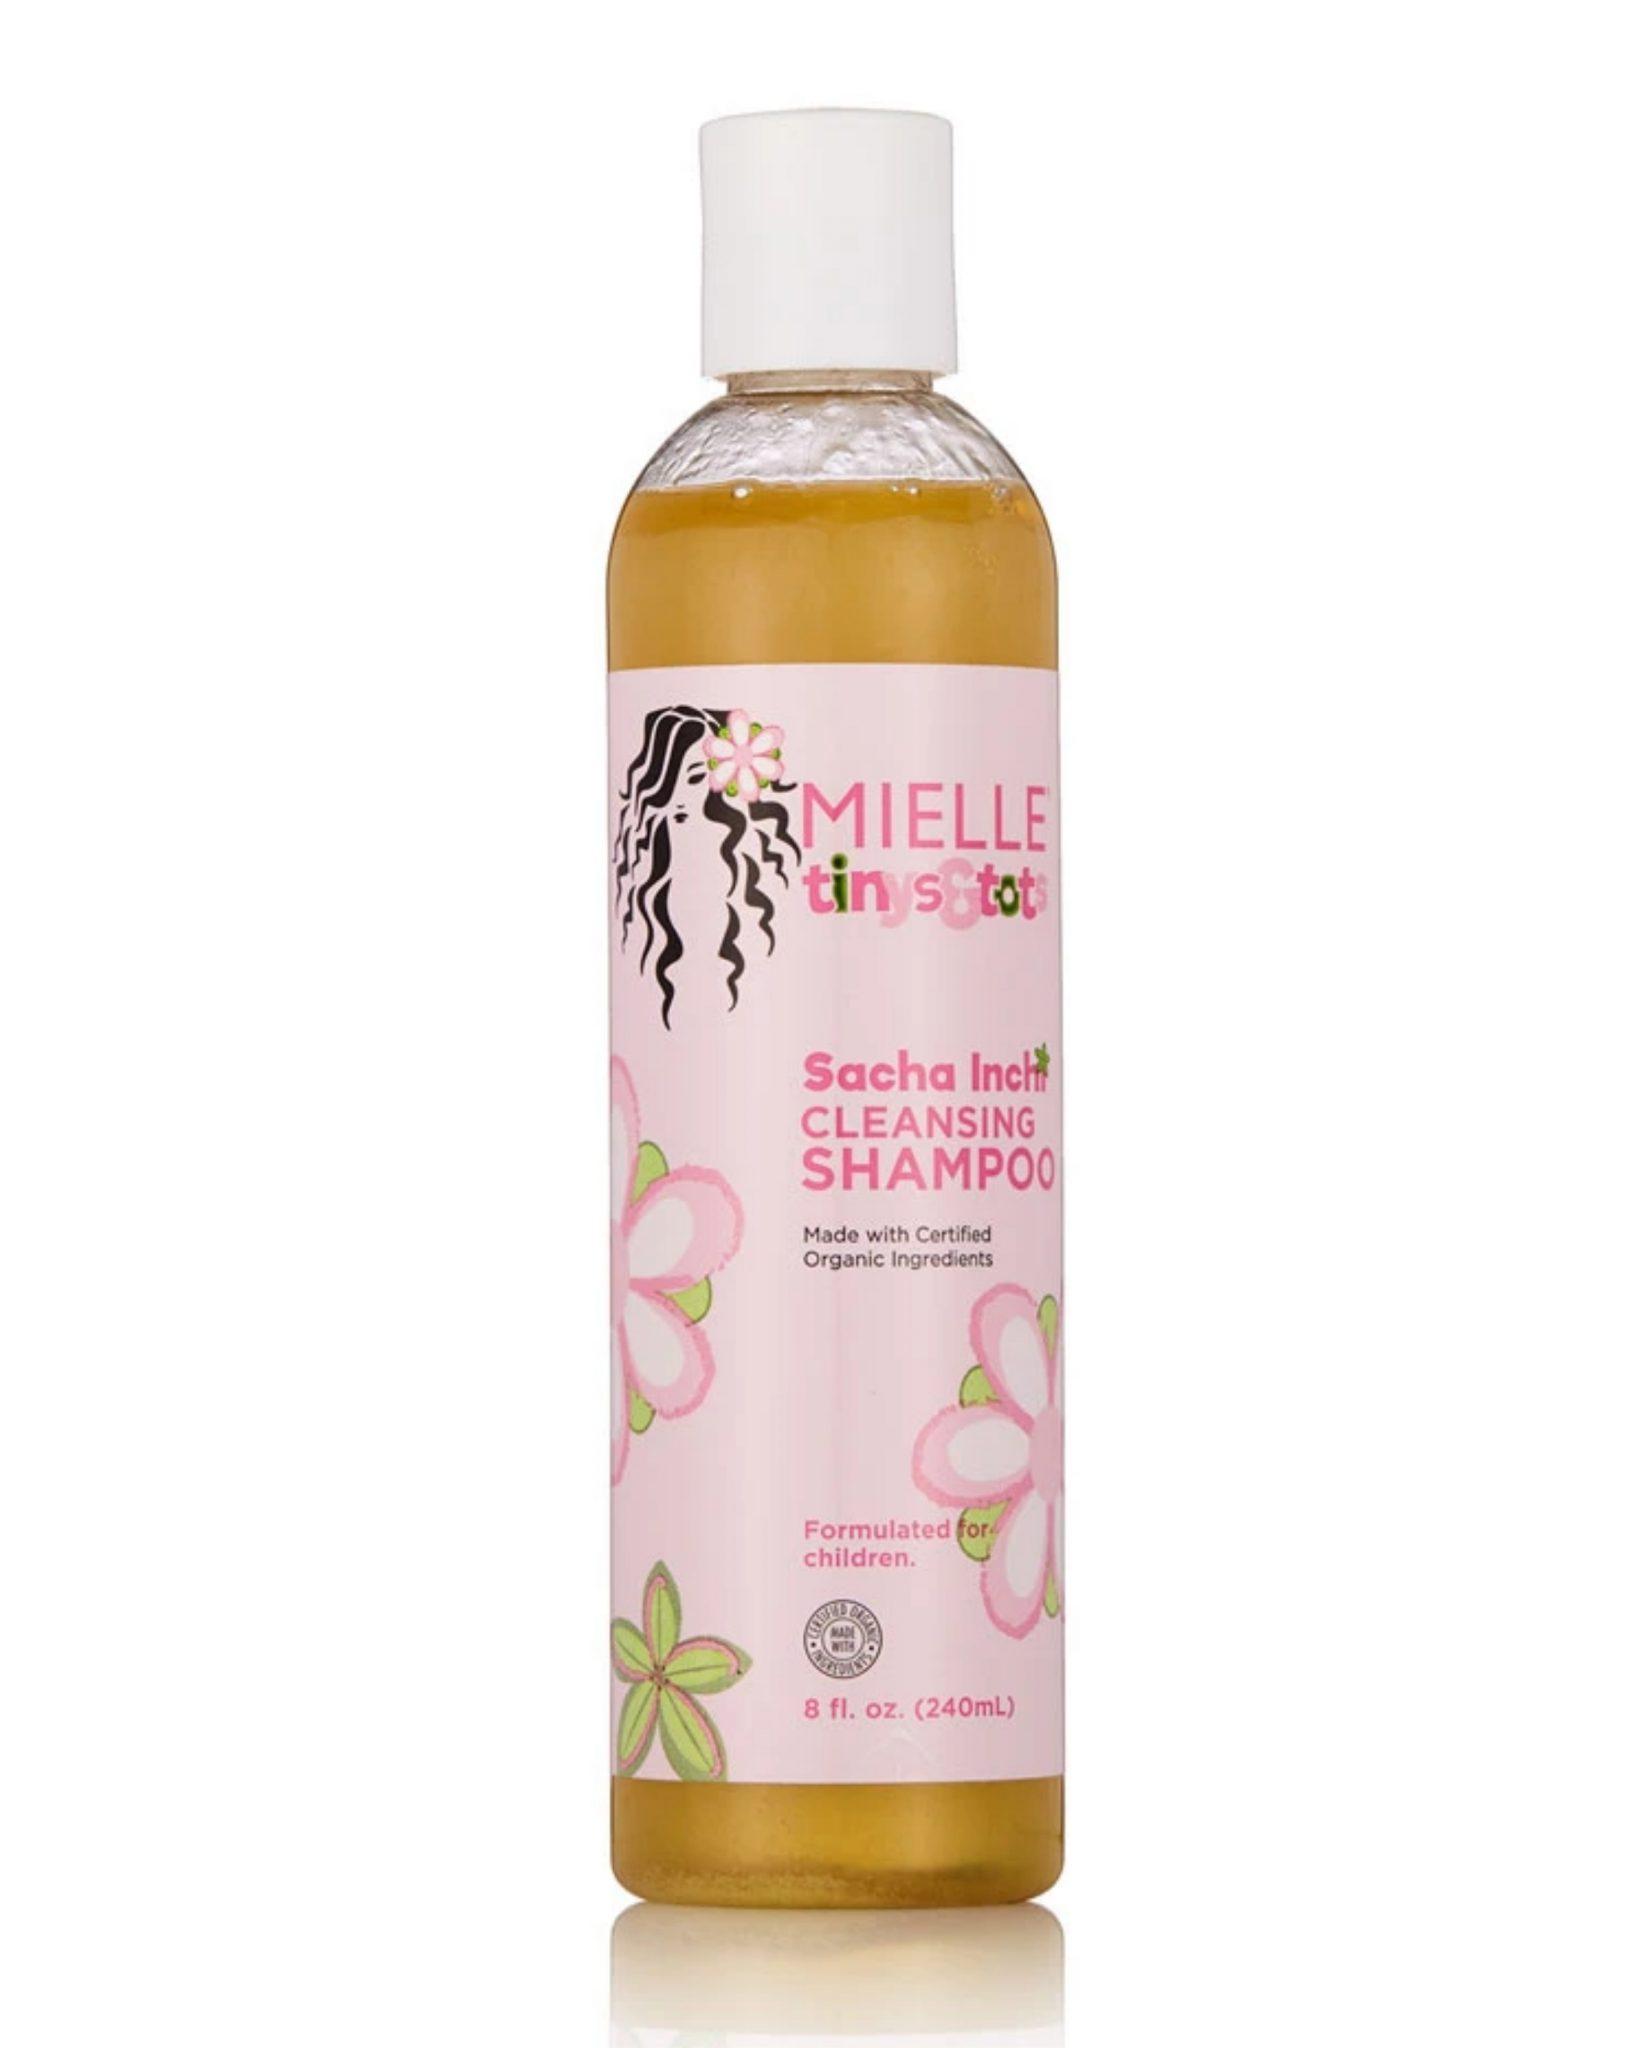 Mielle Organics tinys and tots  sacha inchi cleansing shampoo